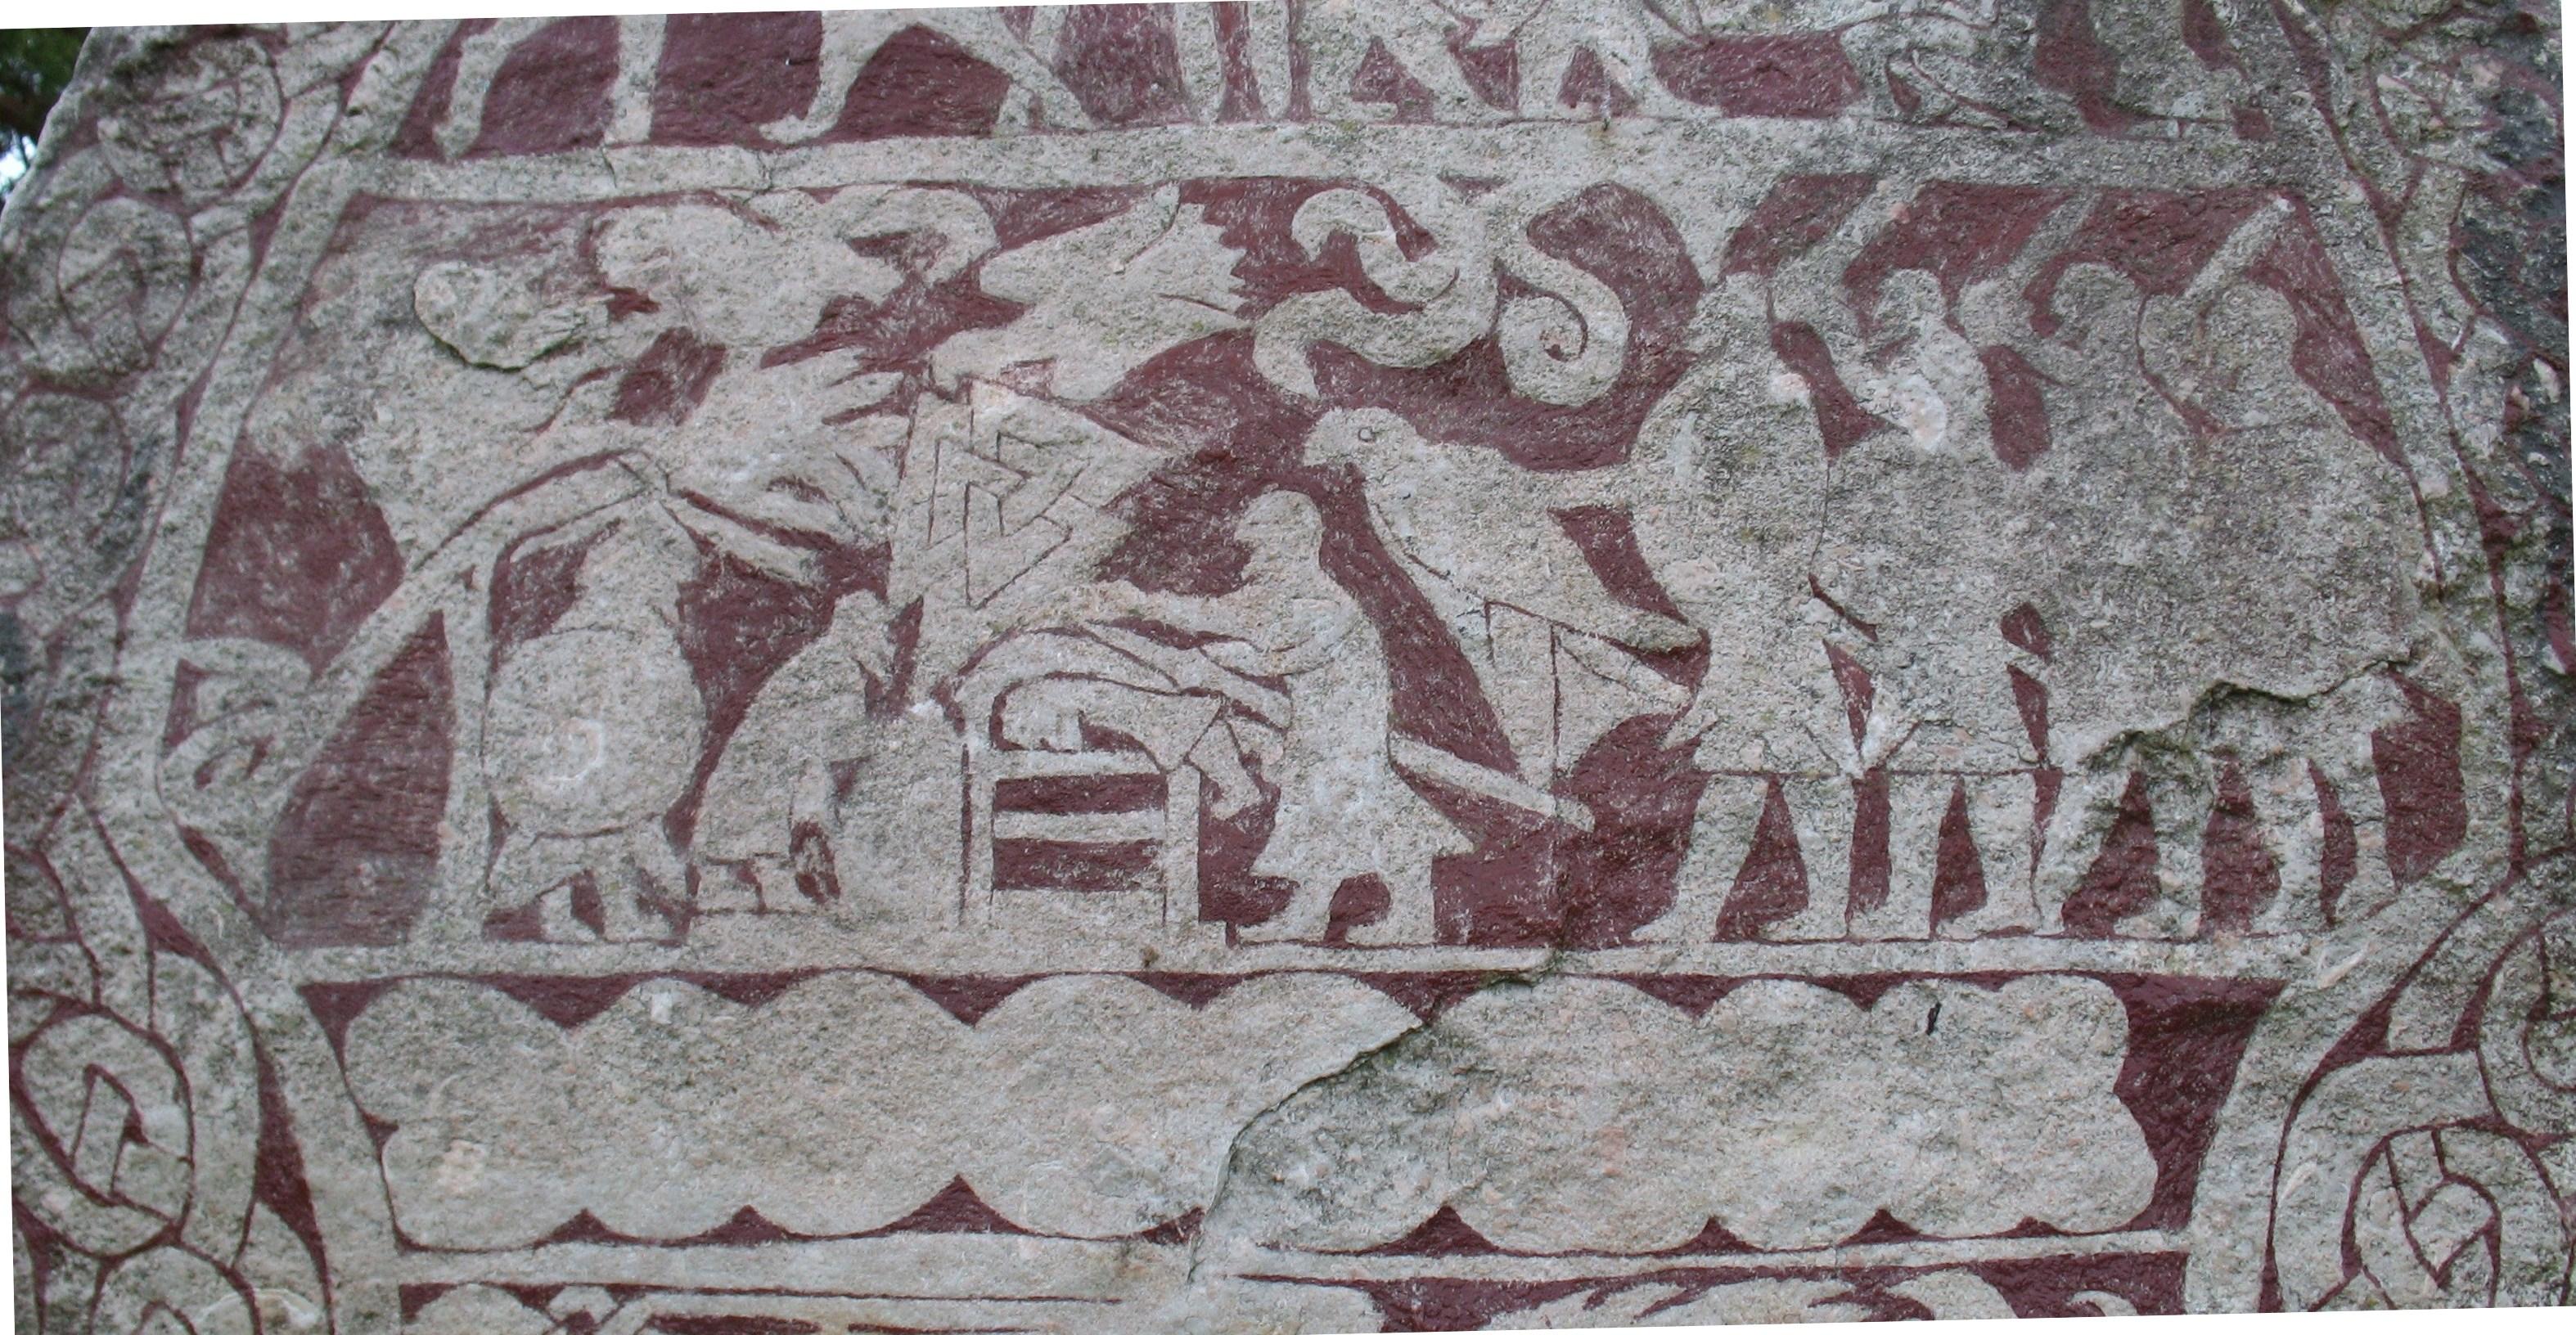 Sacrificial scene on Hammars (I).JPG